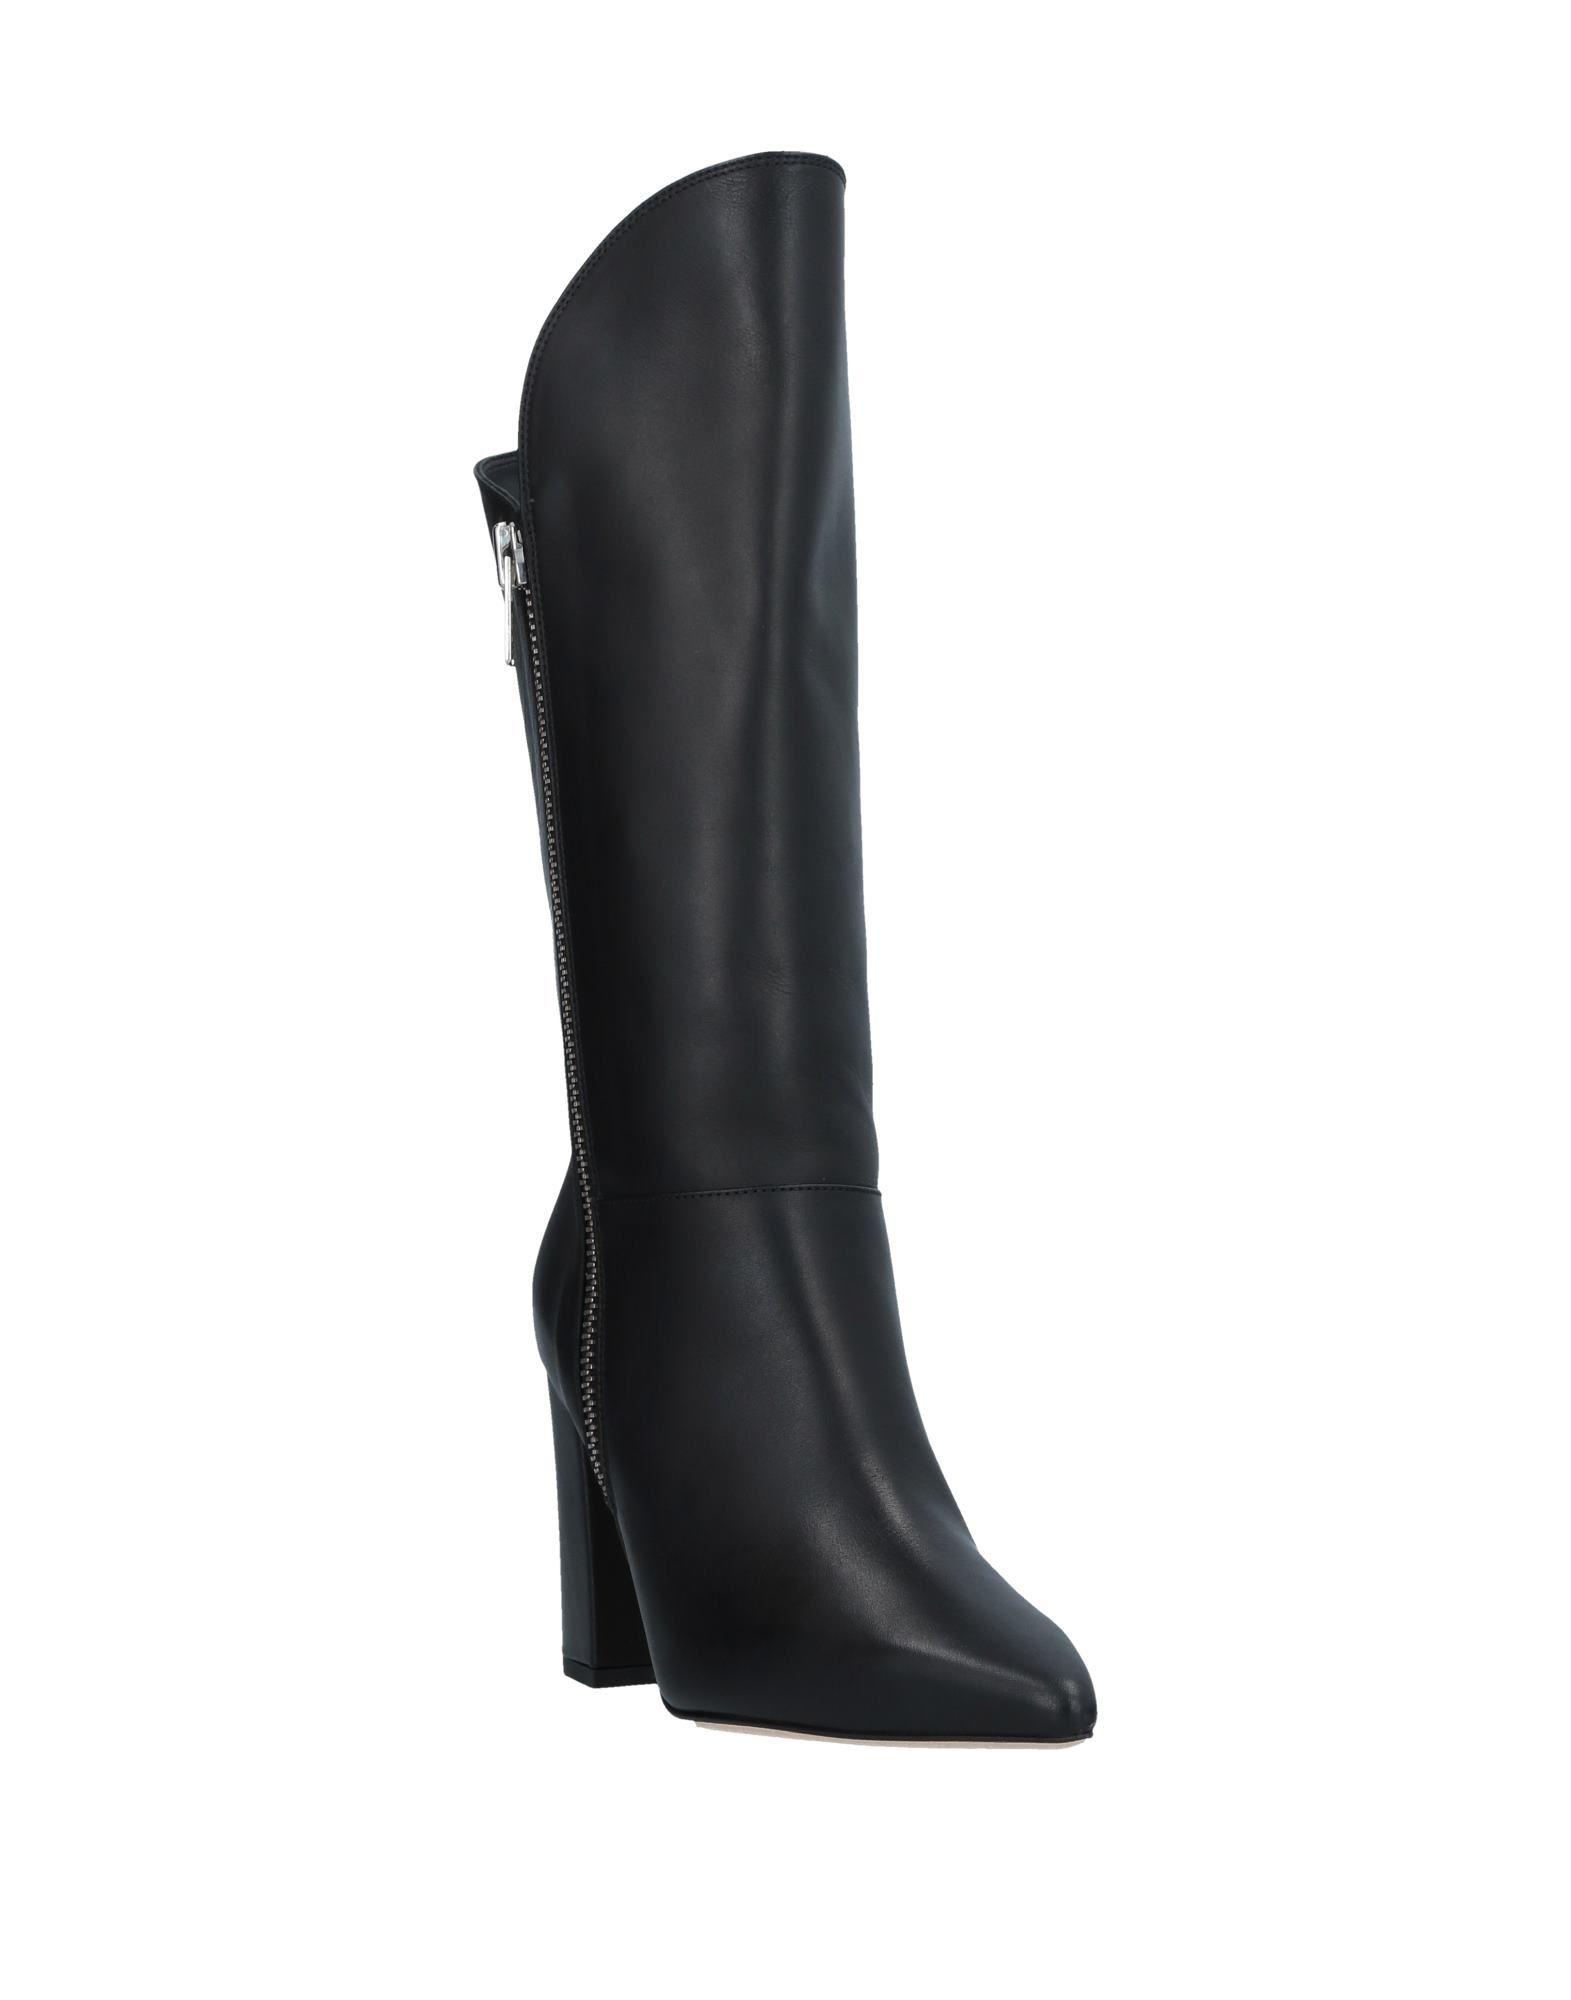 Rabatt Schuhe Pinko Stiefelette Damen 11532786BD  11532786BD Damen fa7a74